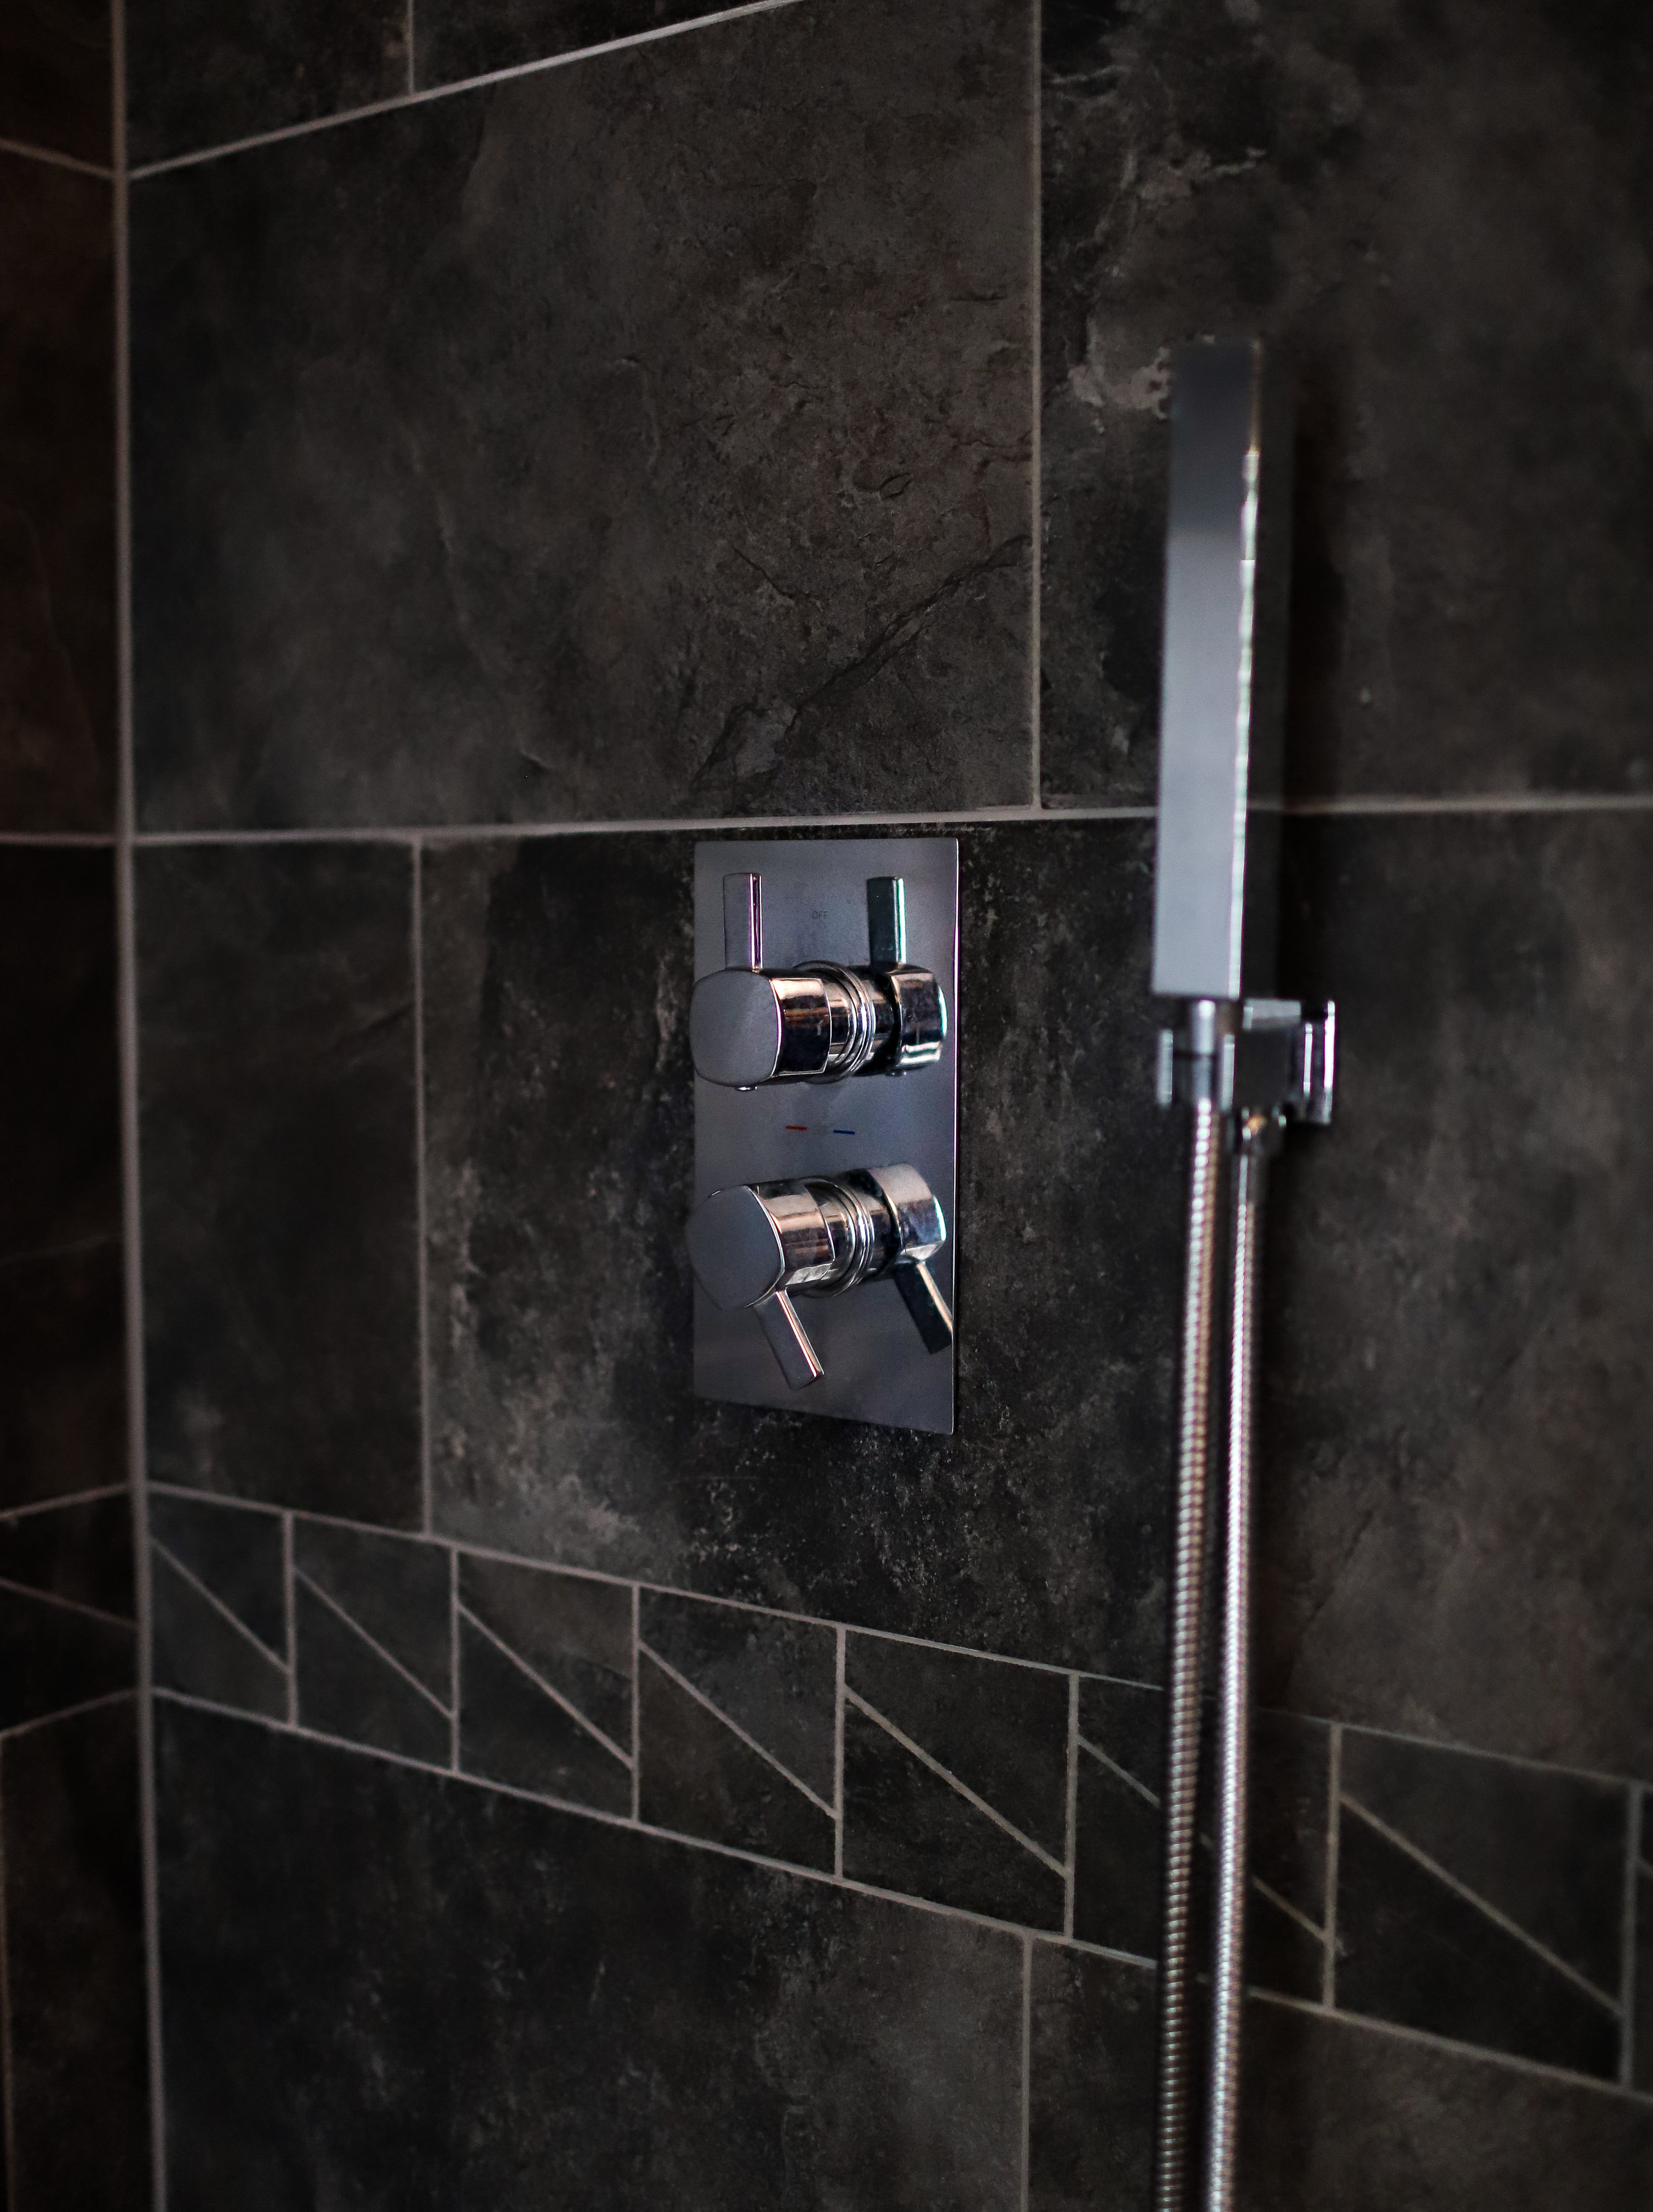 Soak Shower The Find Interiors